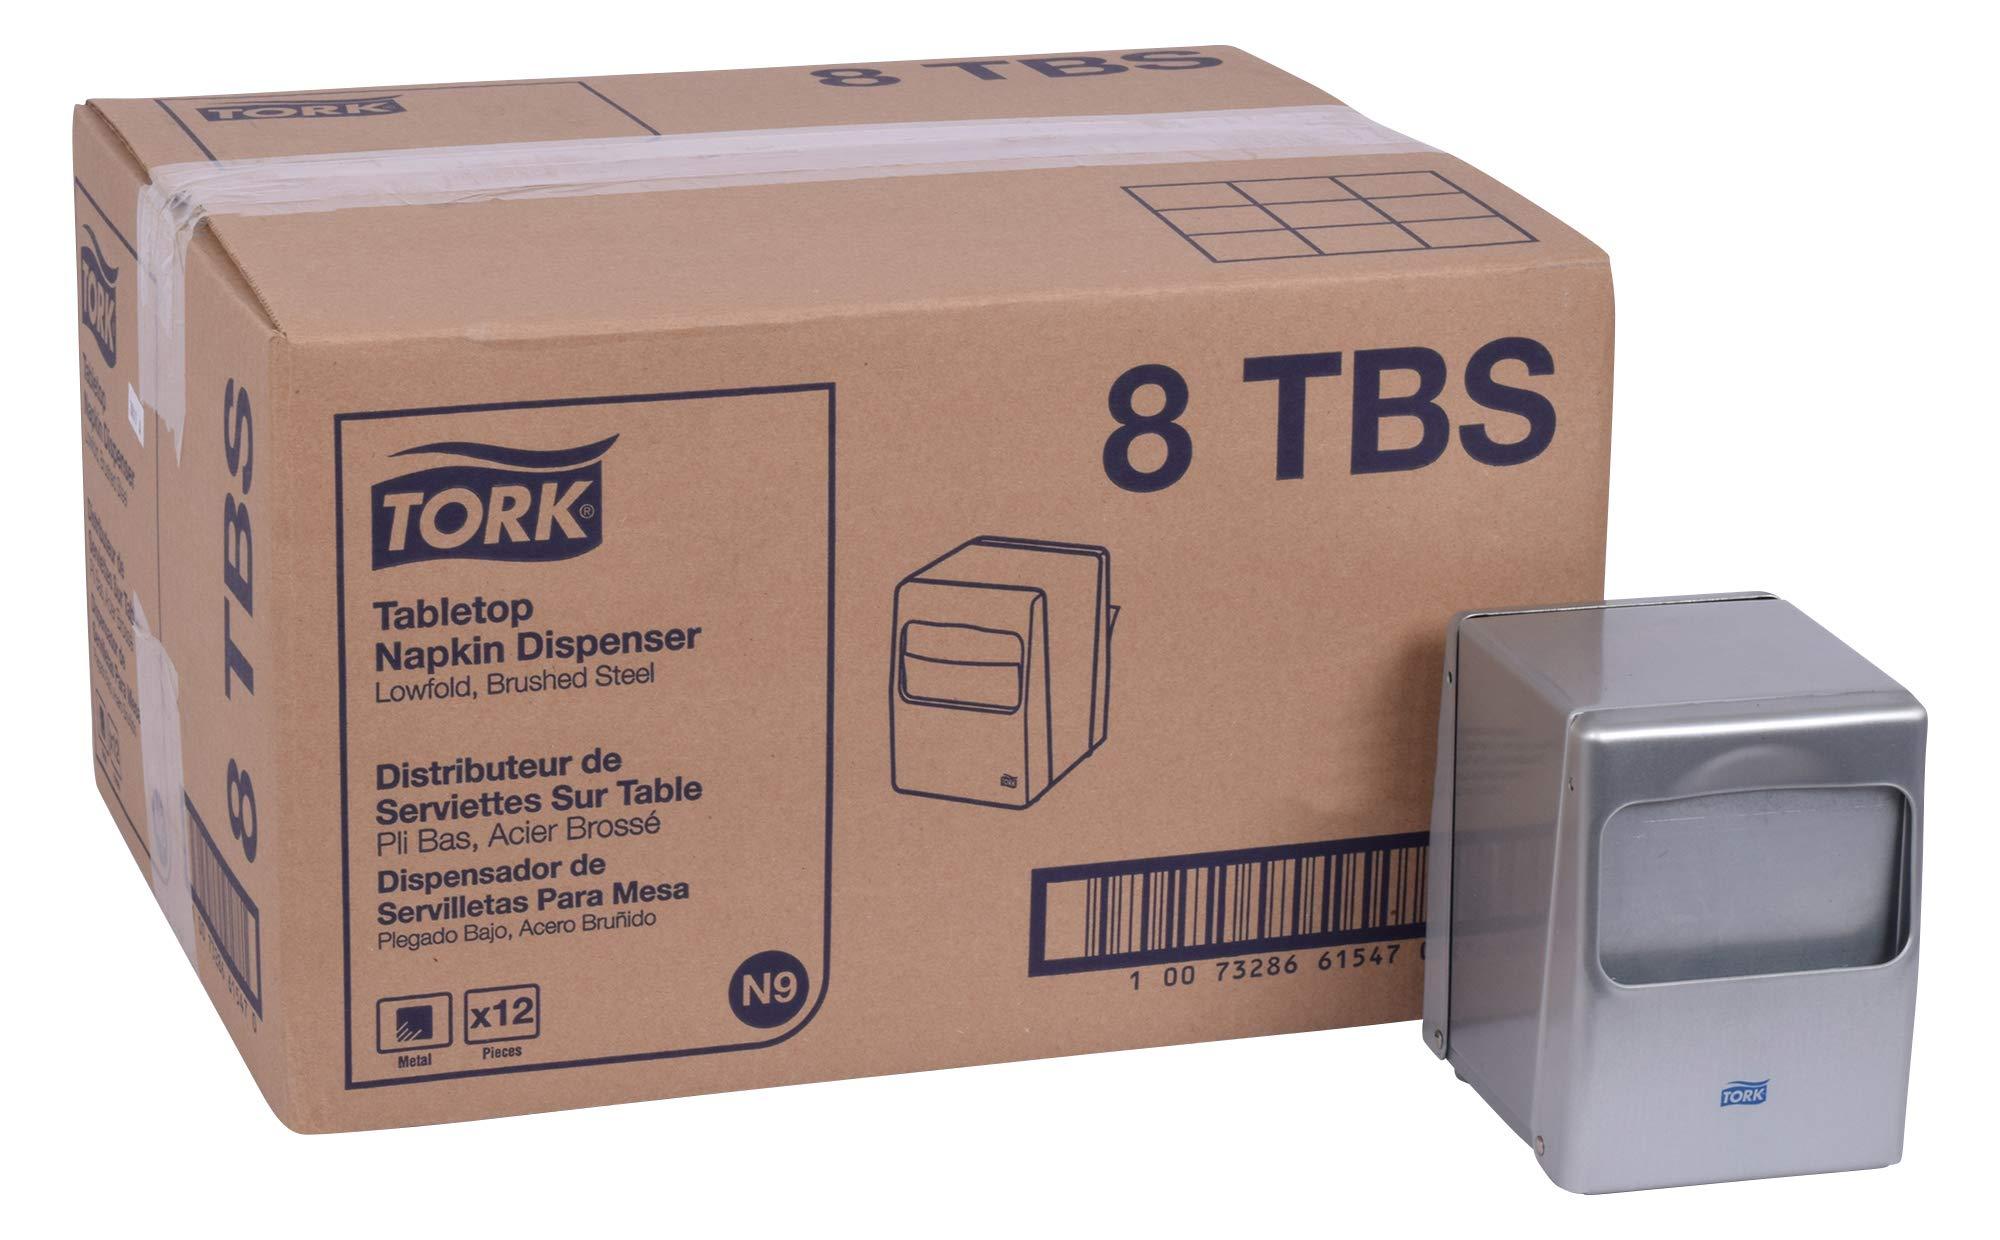 Tork 8TBS Lowfold Tabletop Napkin Dispenser, 5.5'' Height x 4.0'' Width x 4.75'' Depth, Brushed Steel (Case of 12 Dispensers) by Tork